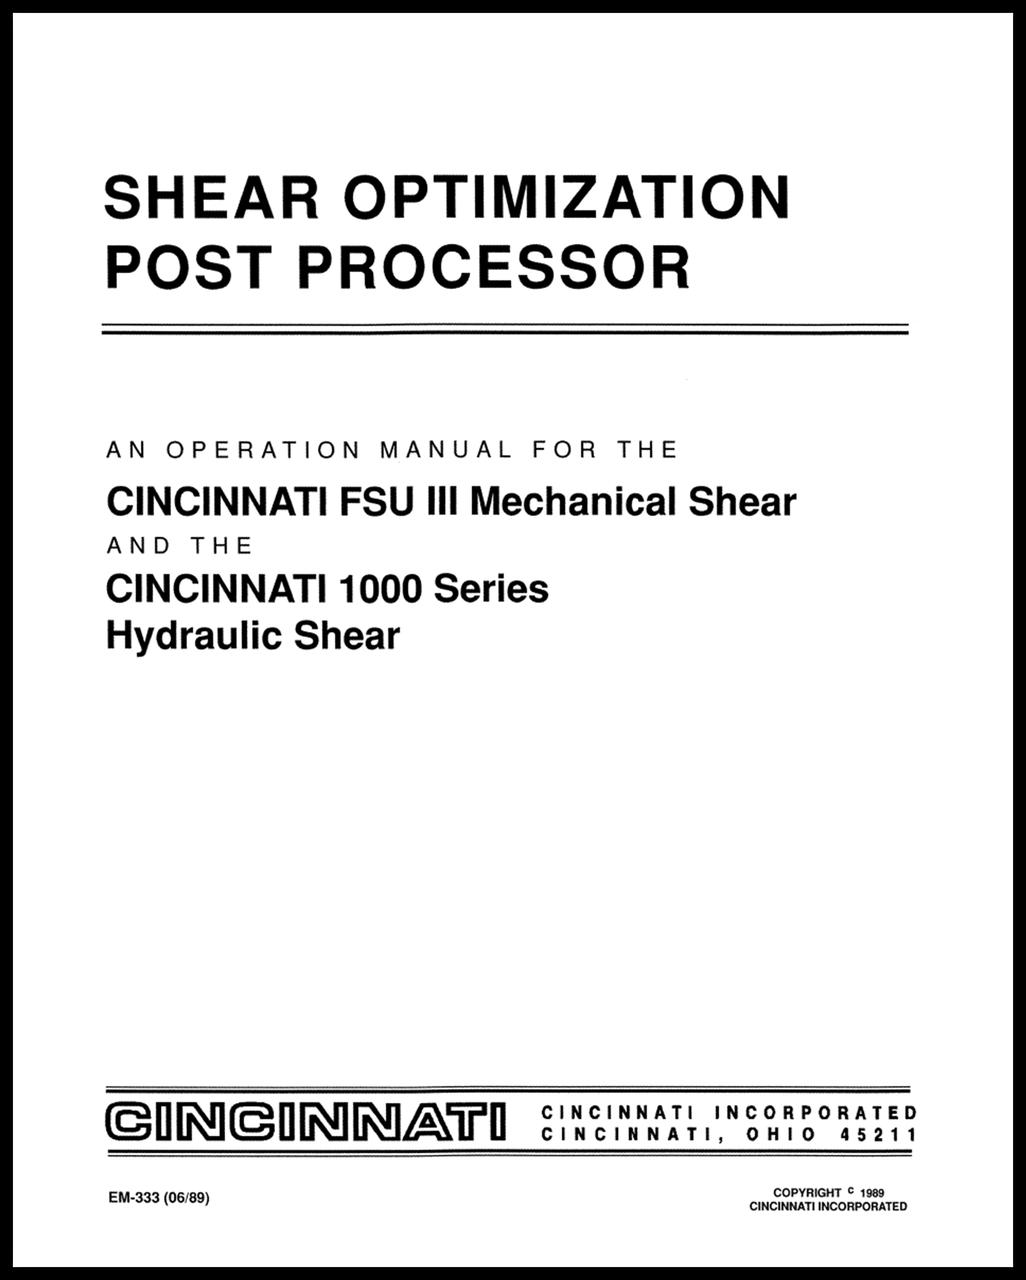 EM-333 (06-89) Shear Optimization Post Processor for FSU III Mechanical Shears and 1000 Series Hydraulic Shears Operation Manual